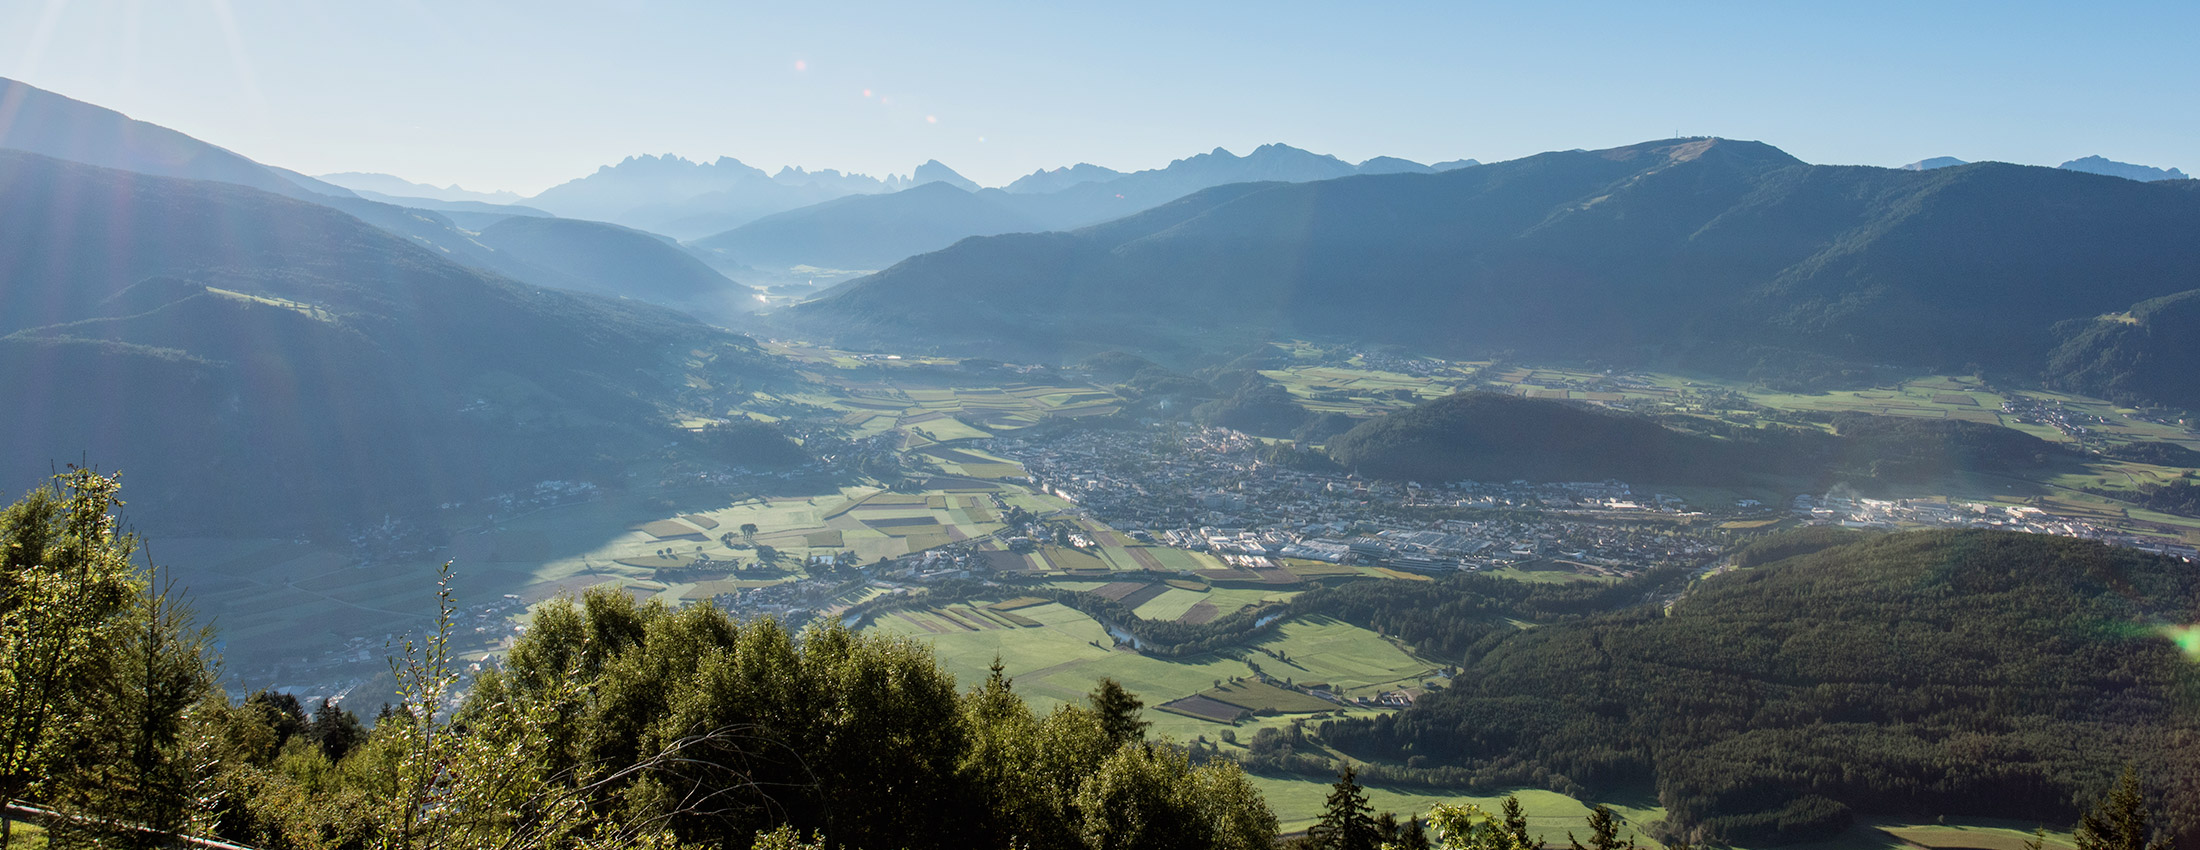 Bruneck im Pustertal in Südtirol